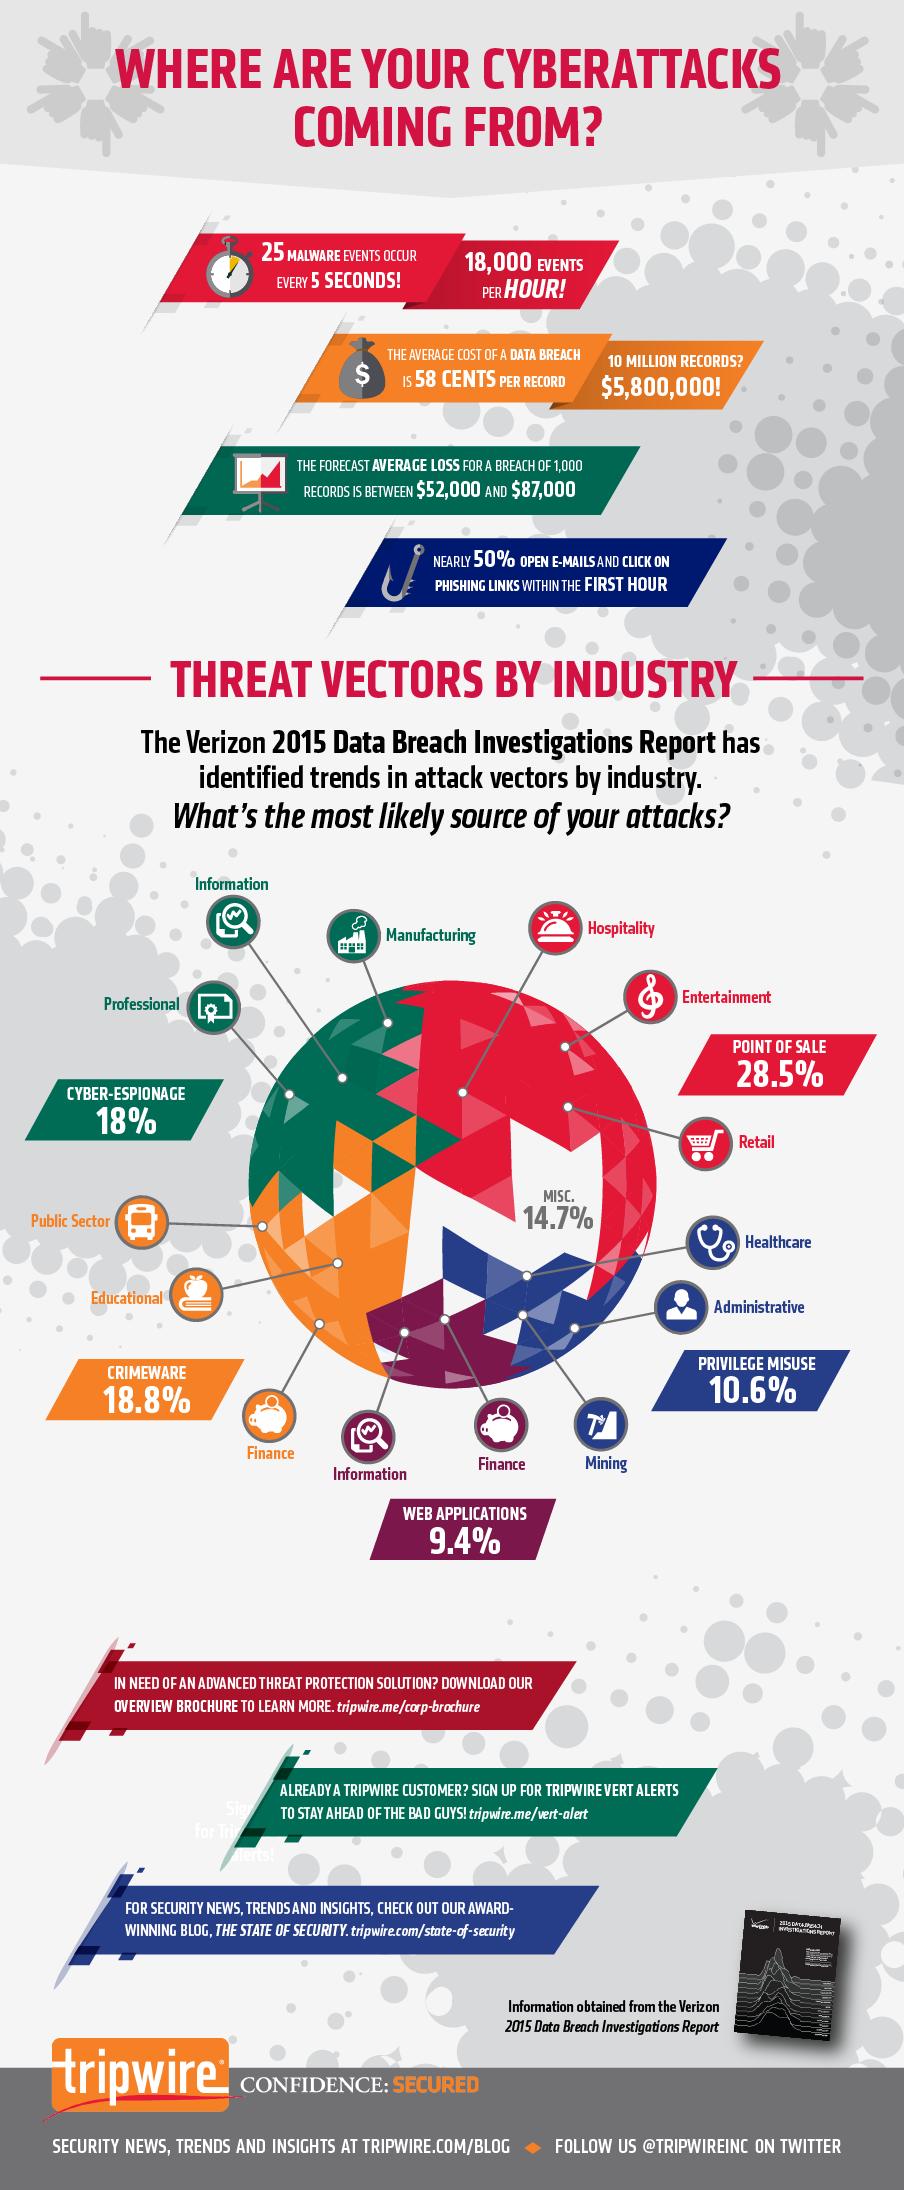 Cyber Attack Origins